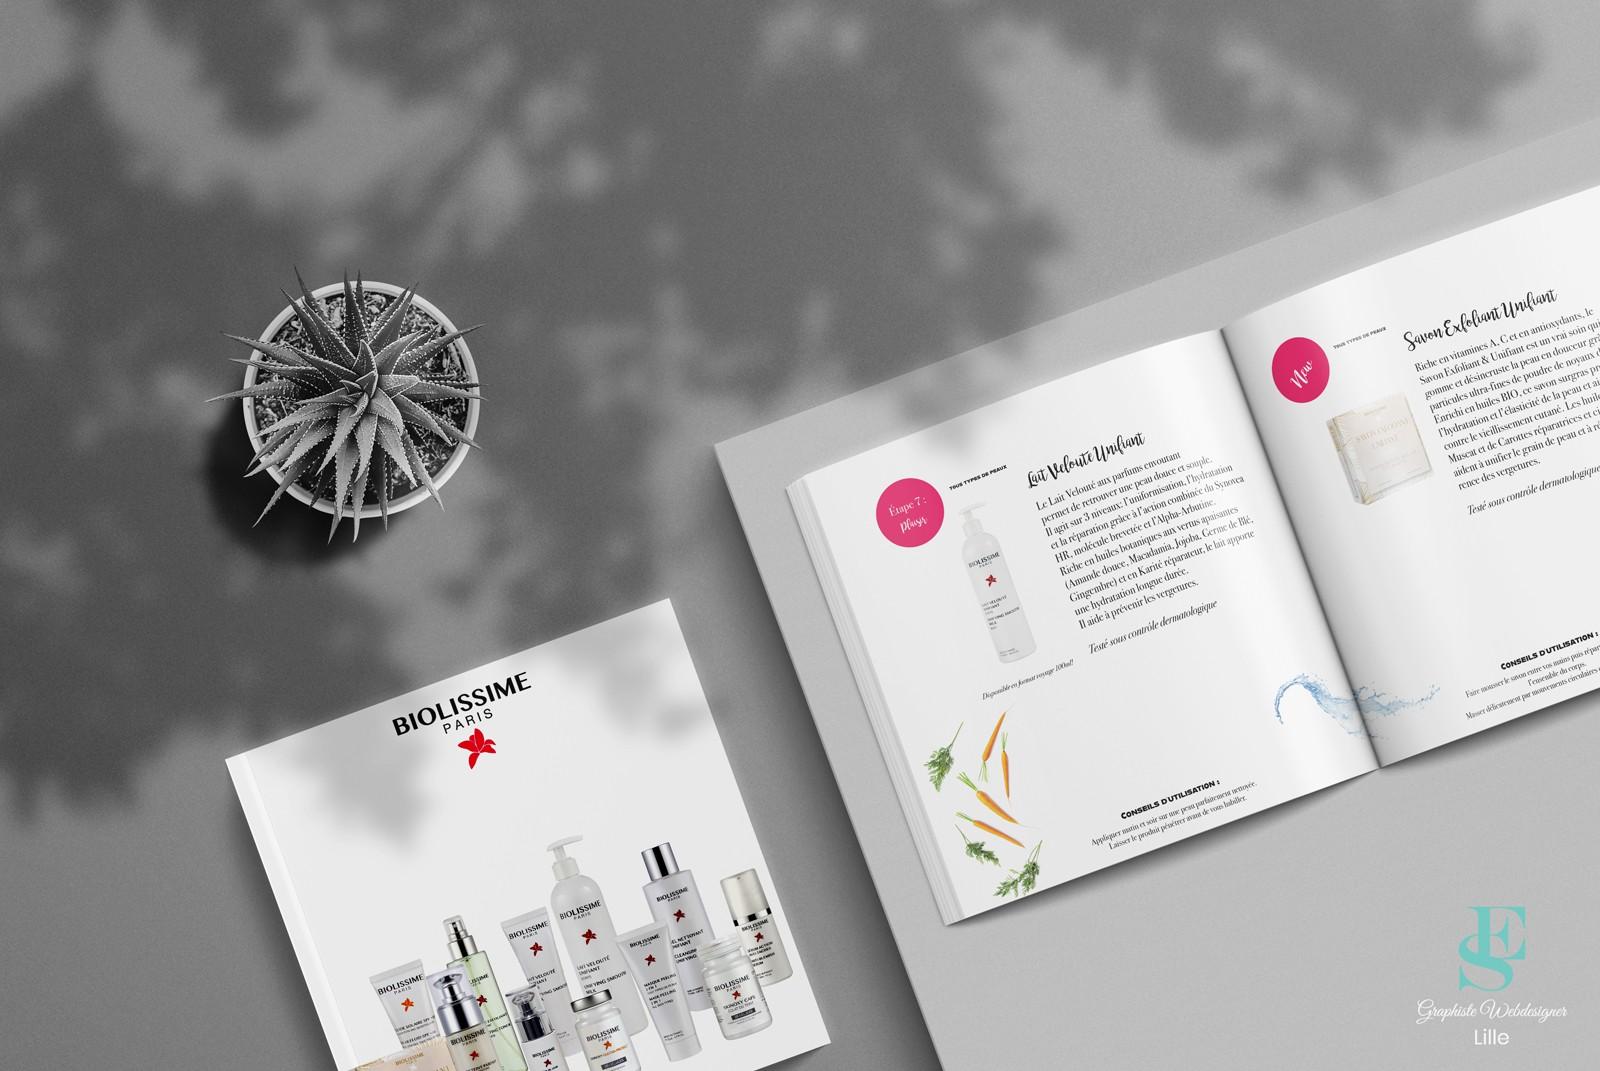 Catalogue Biolissime